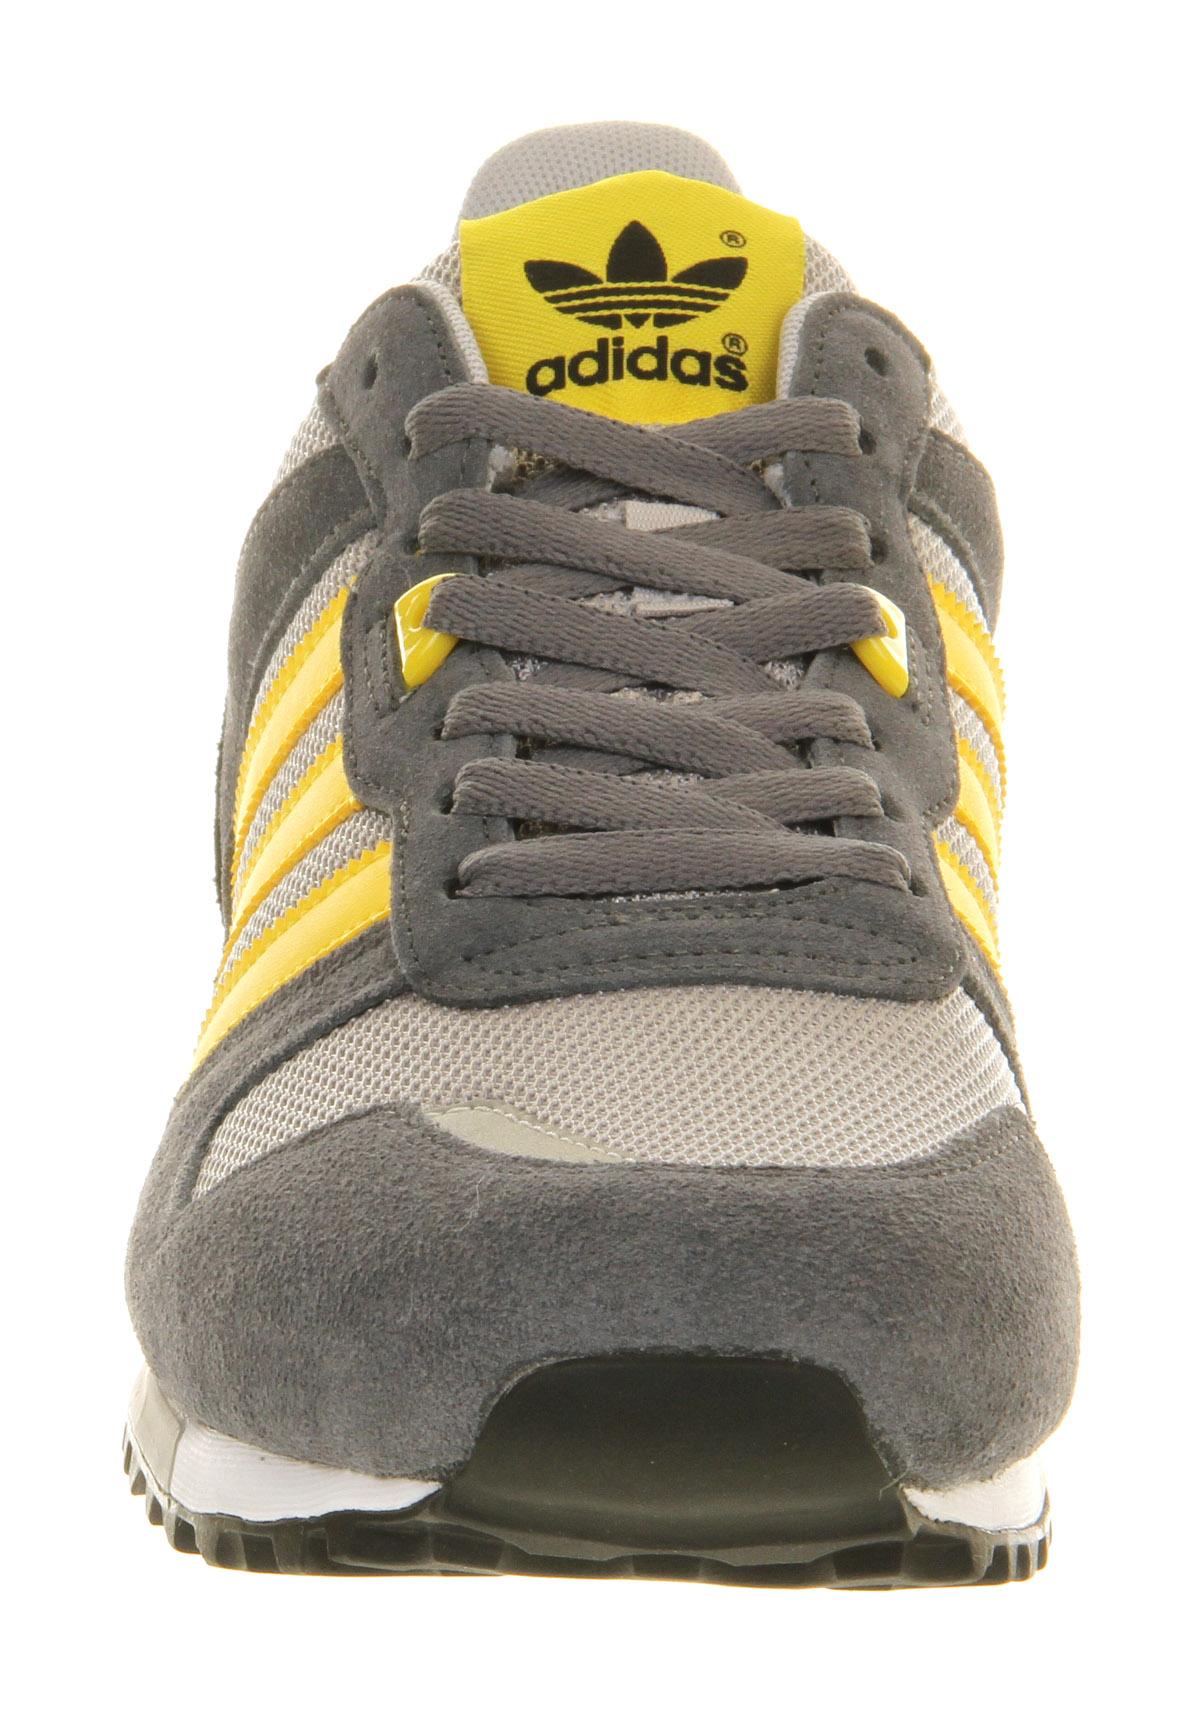 adidas superstar 80s lead grey polka dot smu